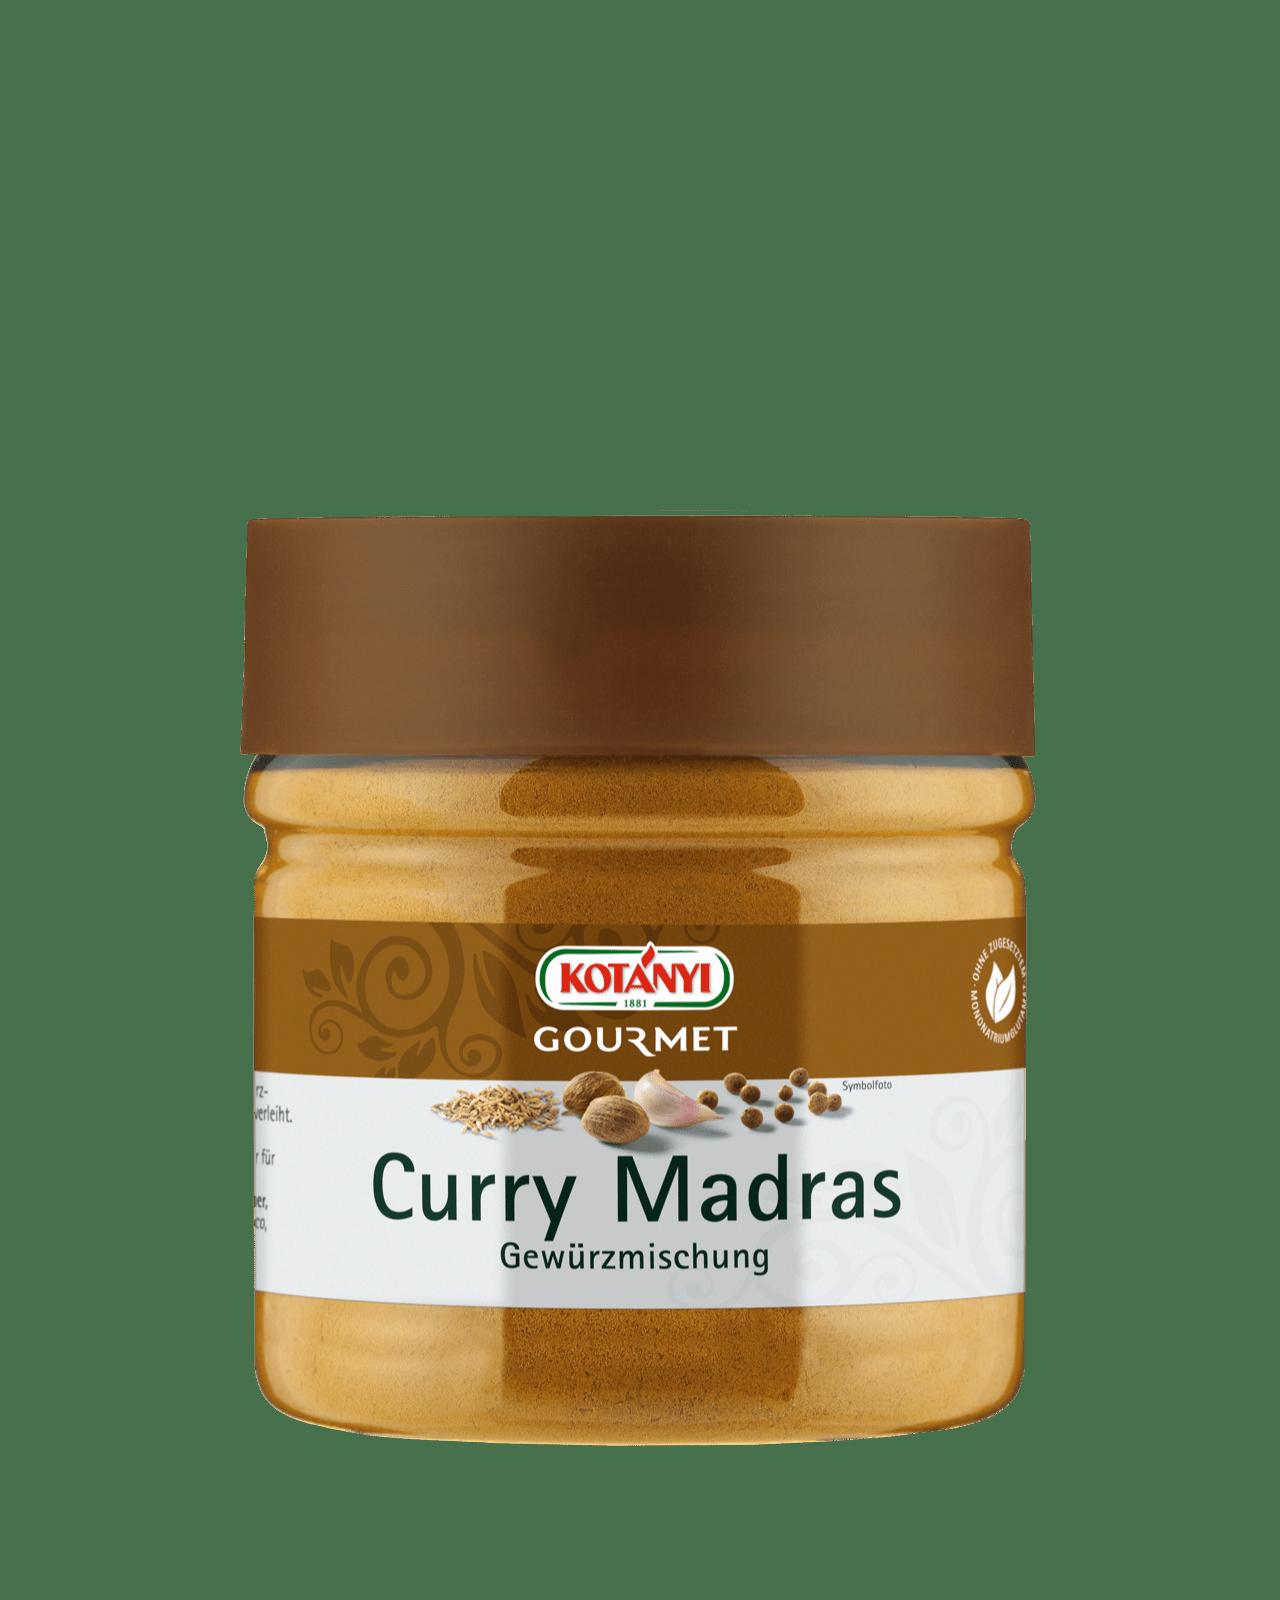 Kotányi Gourmet Curry Madras Gewürzmischung in der 400ccm Dose